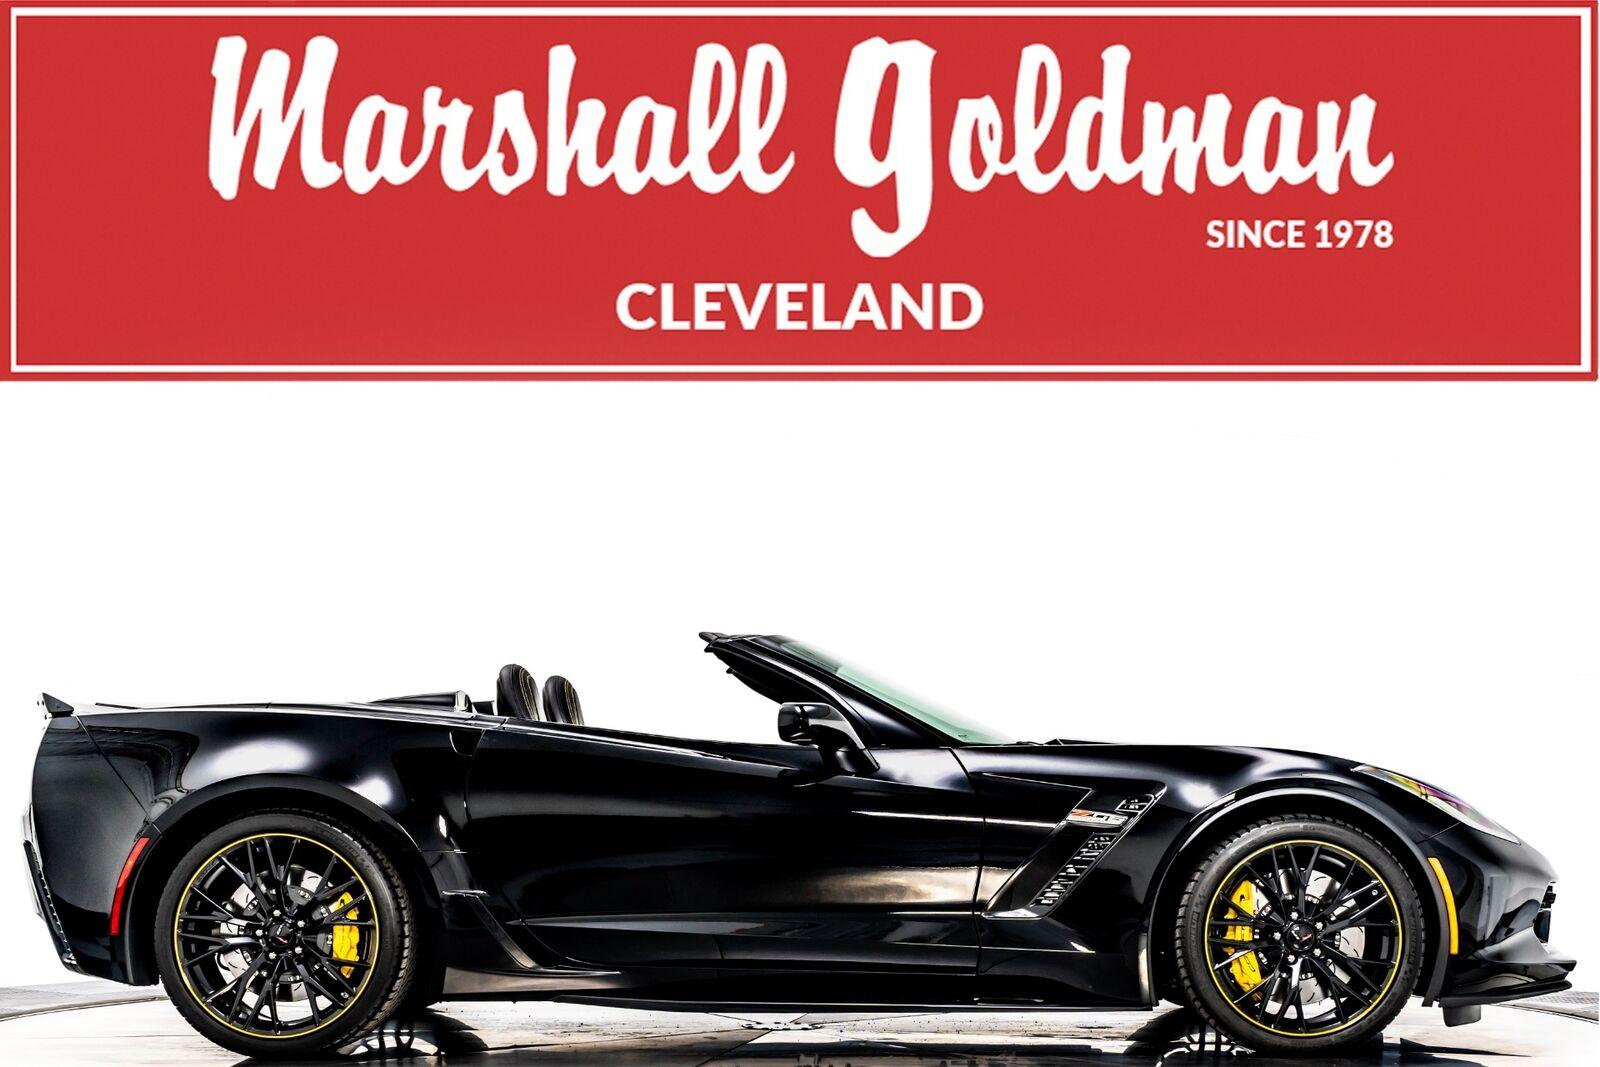 2018 Black Chevrolet Corvette Z06 3LZ   C7 Corvette Photo 1